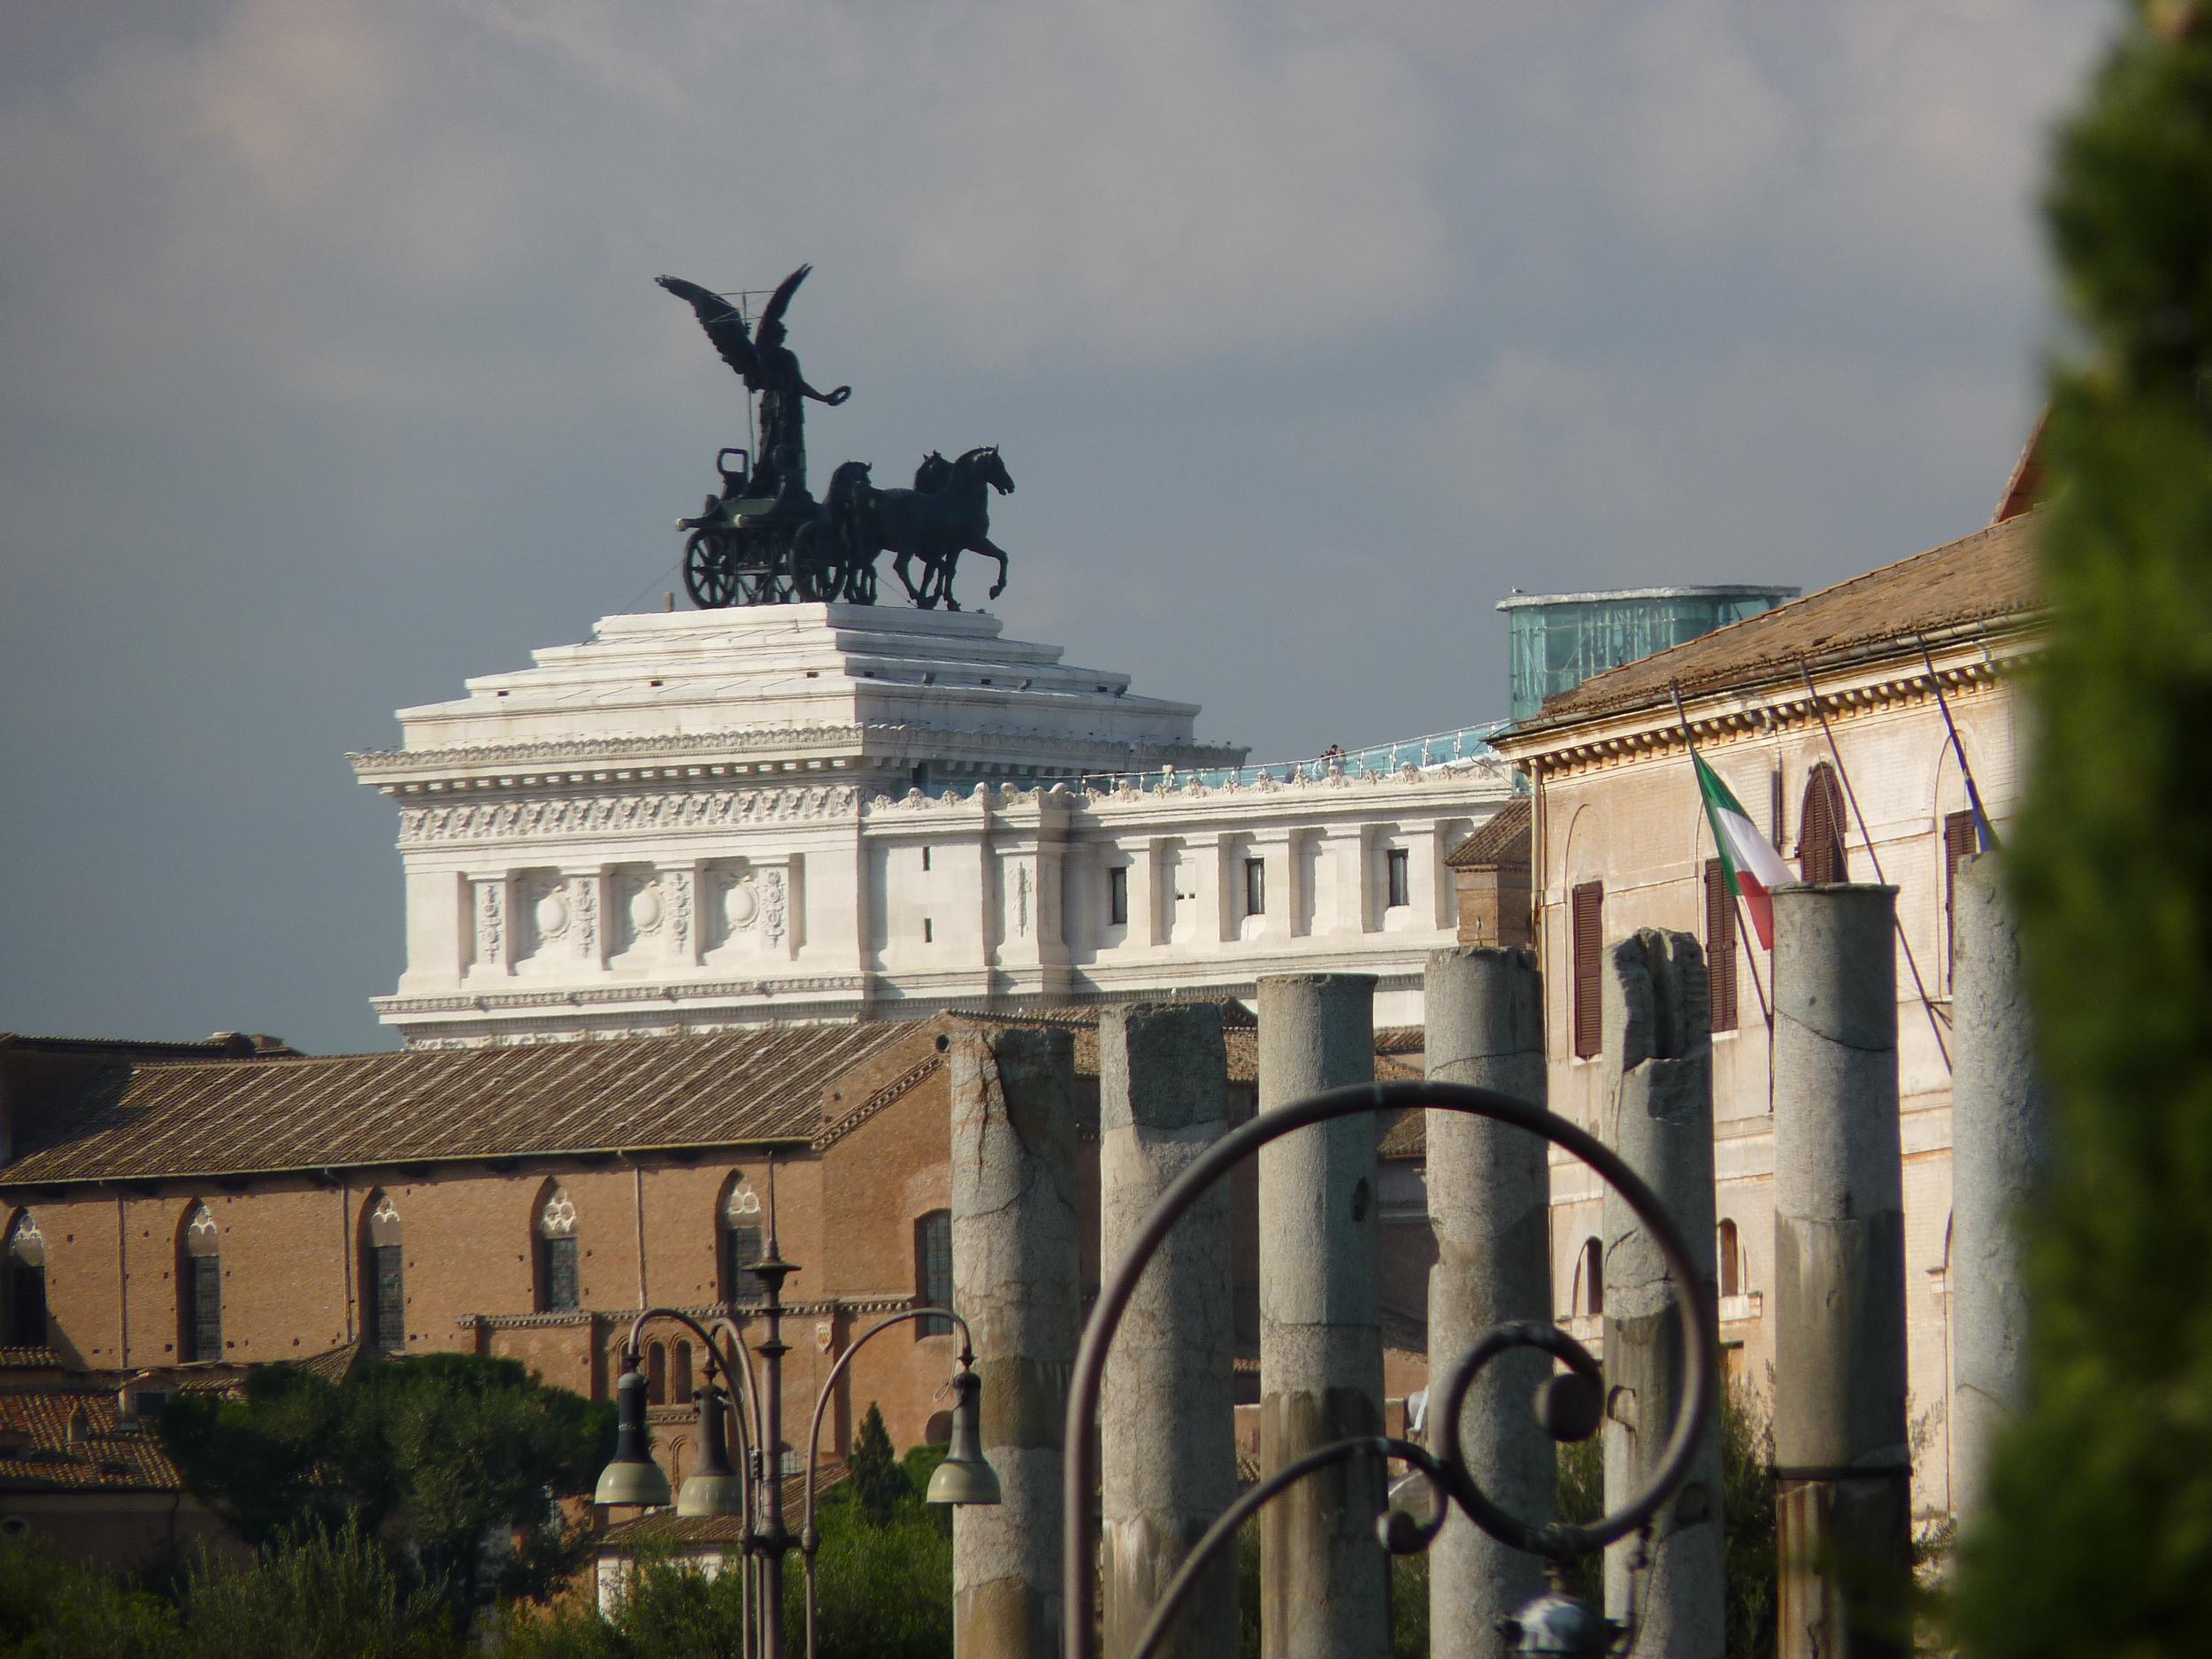 CRO Italy web 2009 - 68.JPG